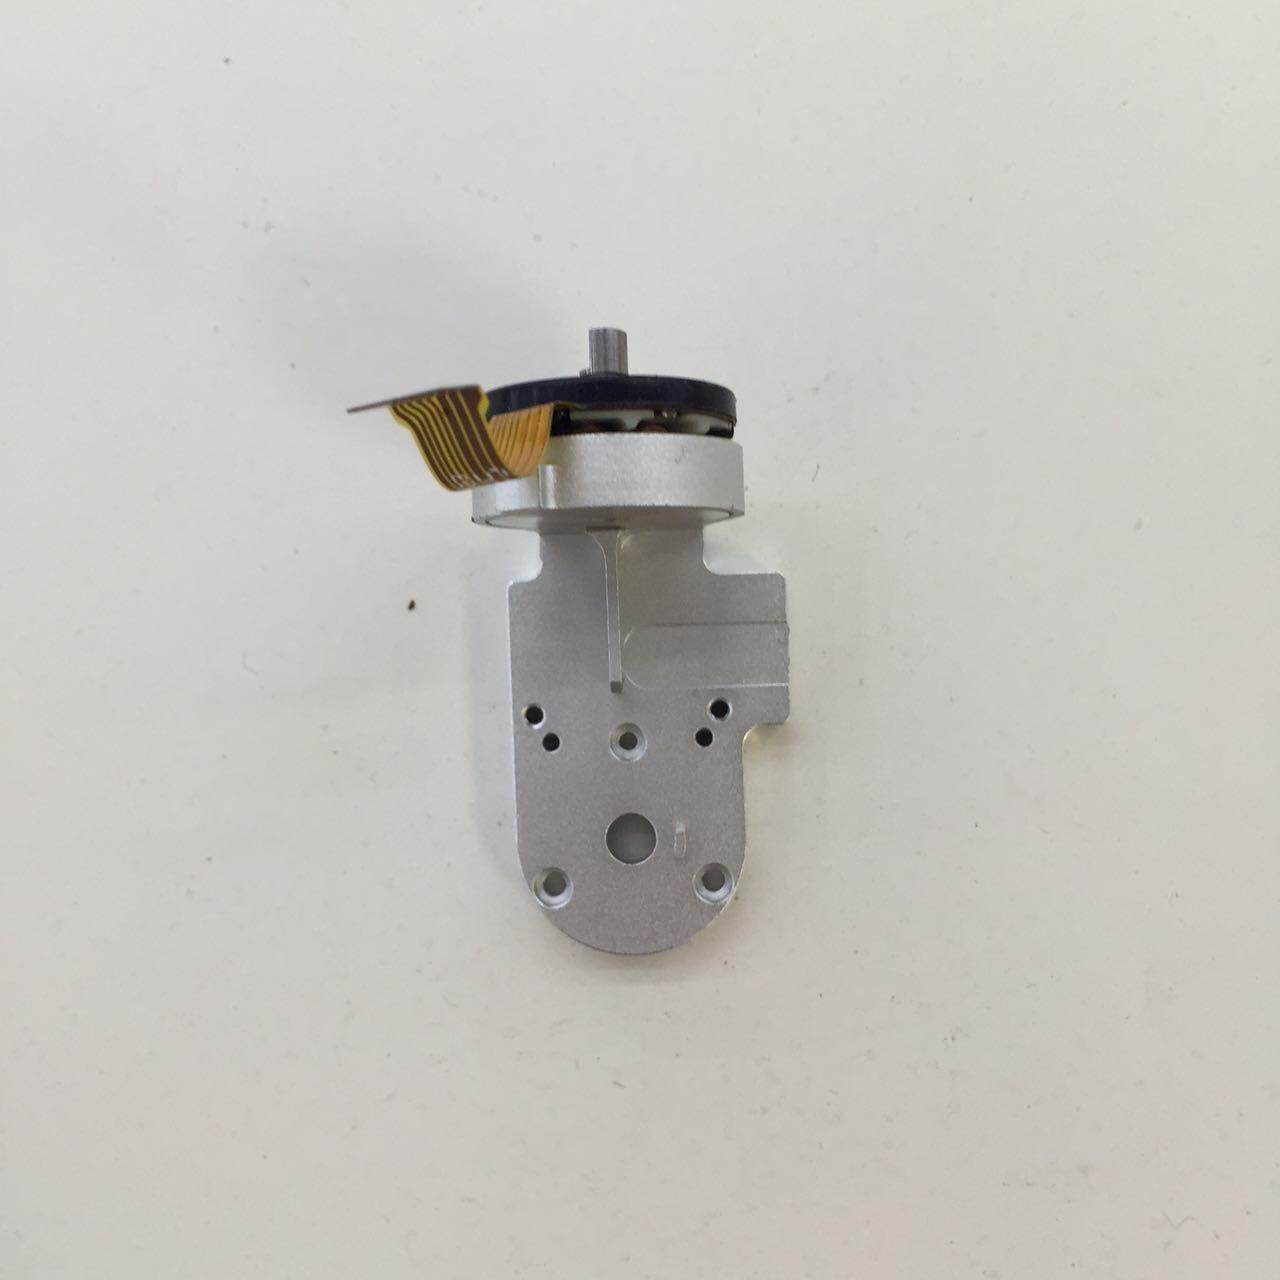 Roll Arm & Roll Motor Gimbal Camera Repair Part for DJI Phantom 3 Advanced/Professional Quadcopter